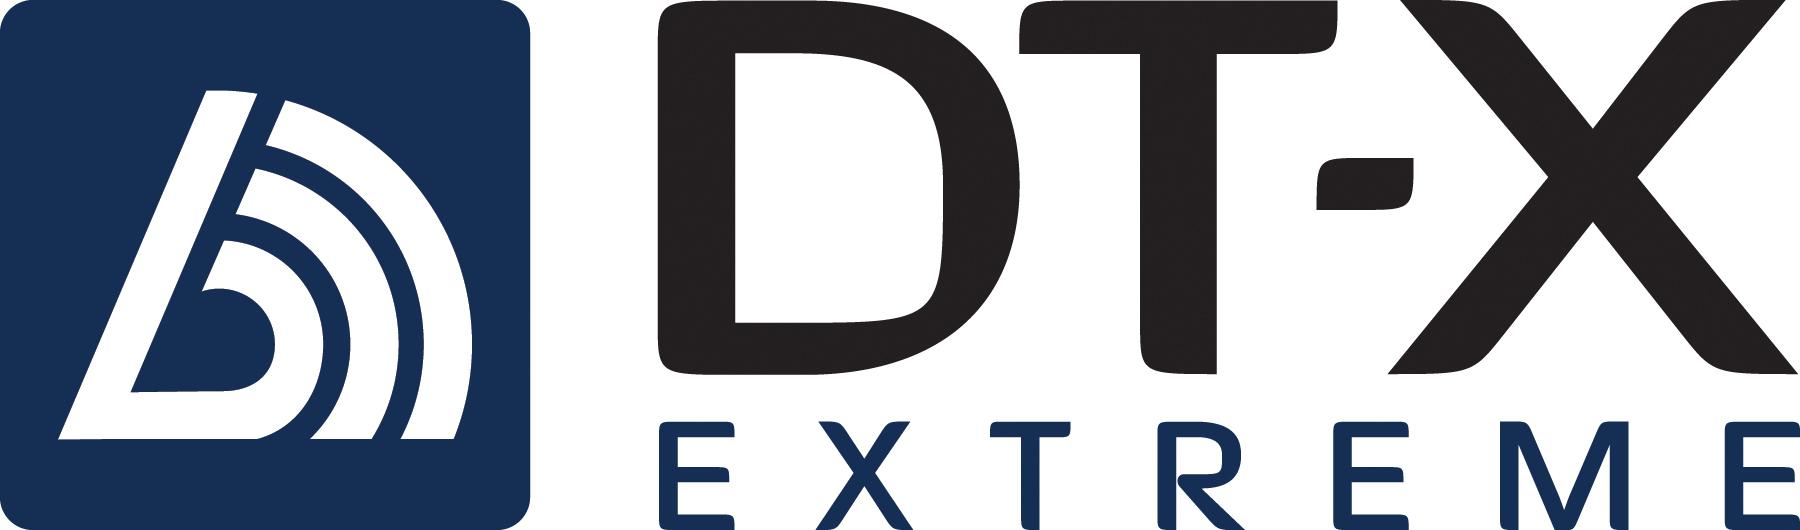 DT-X Extreme